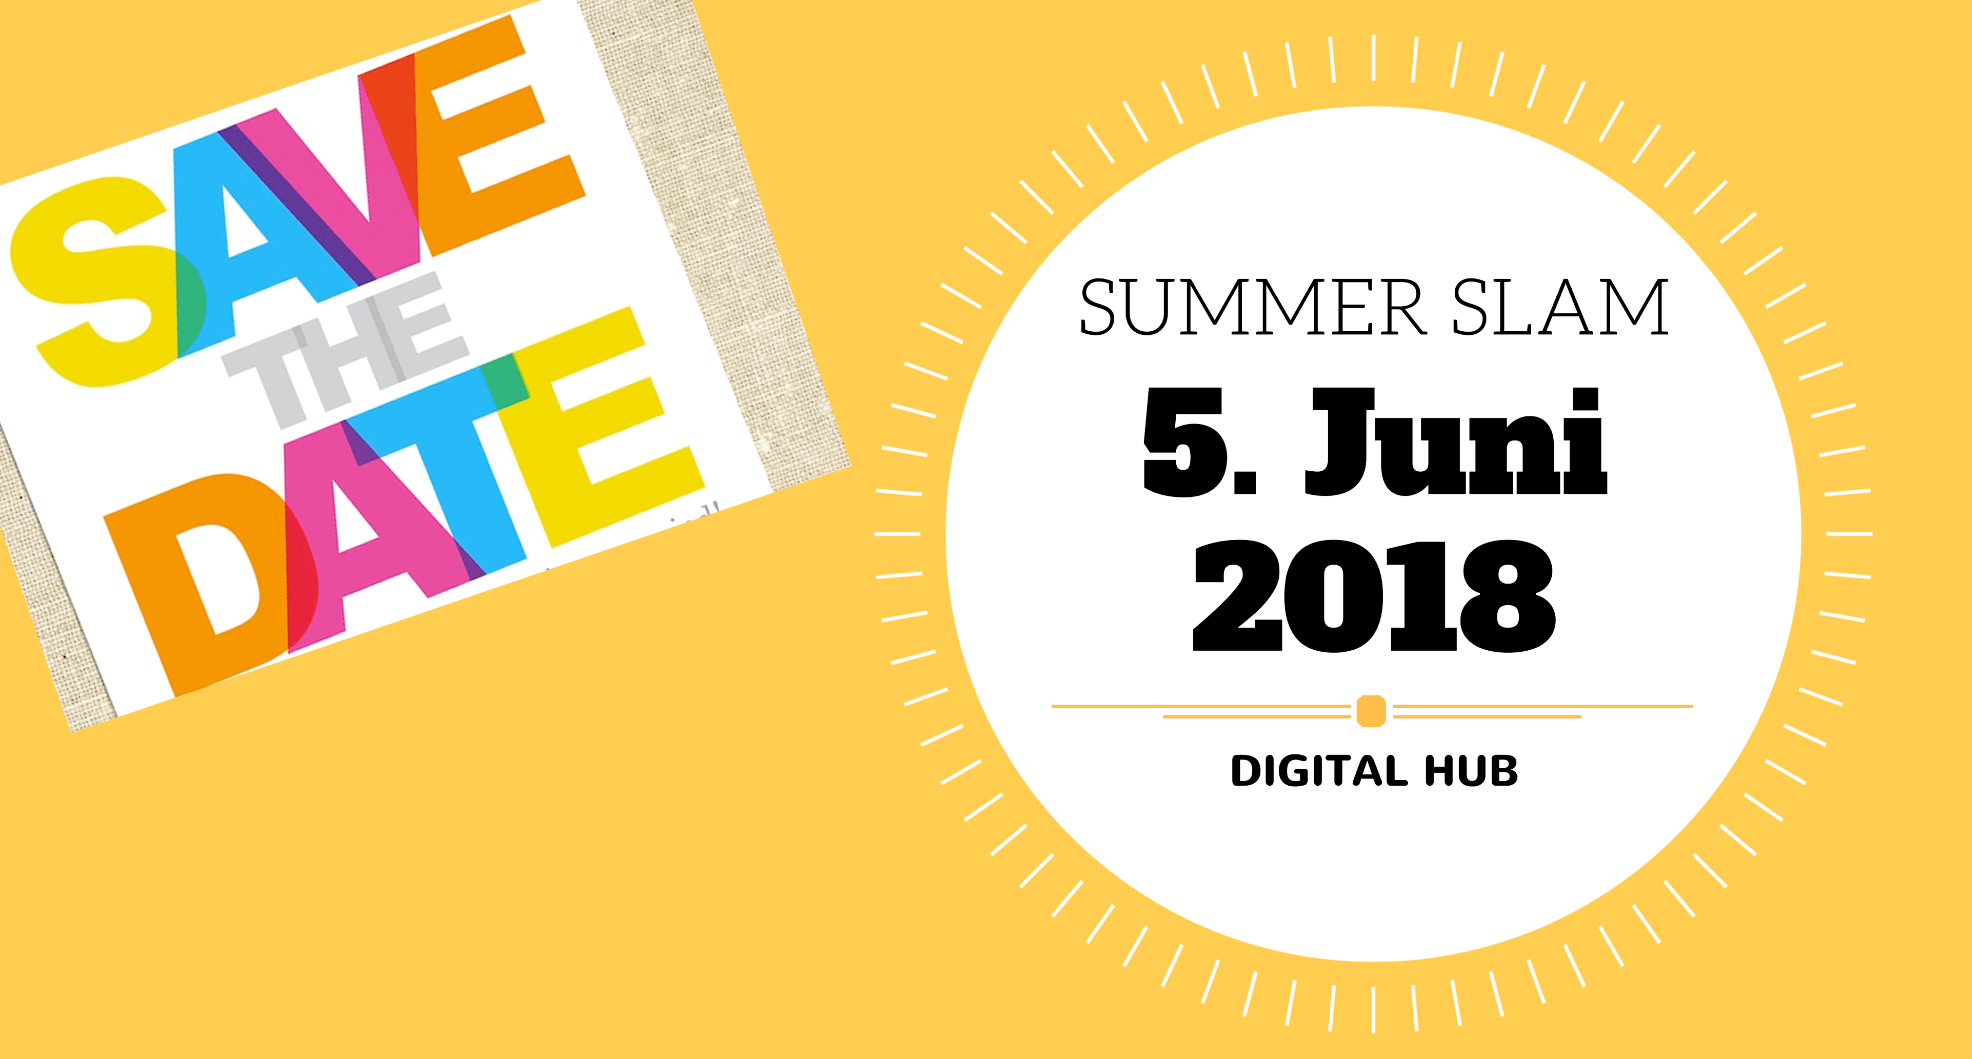 Wir, beim Summer Slam 2018 in Bonn